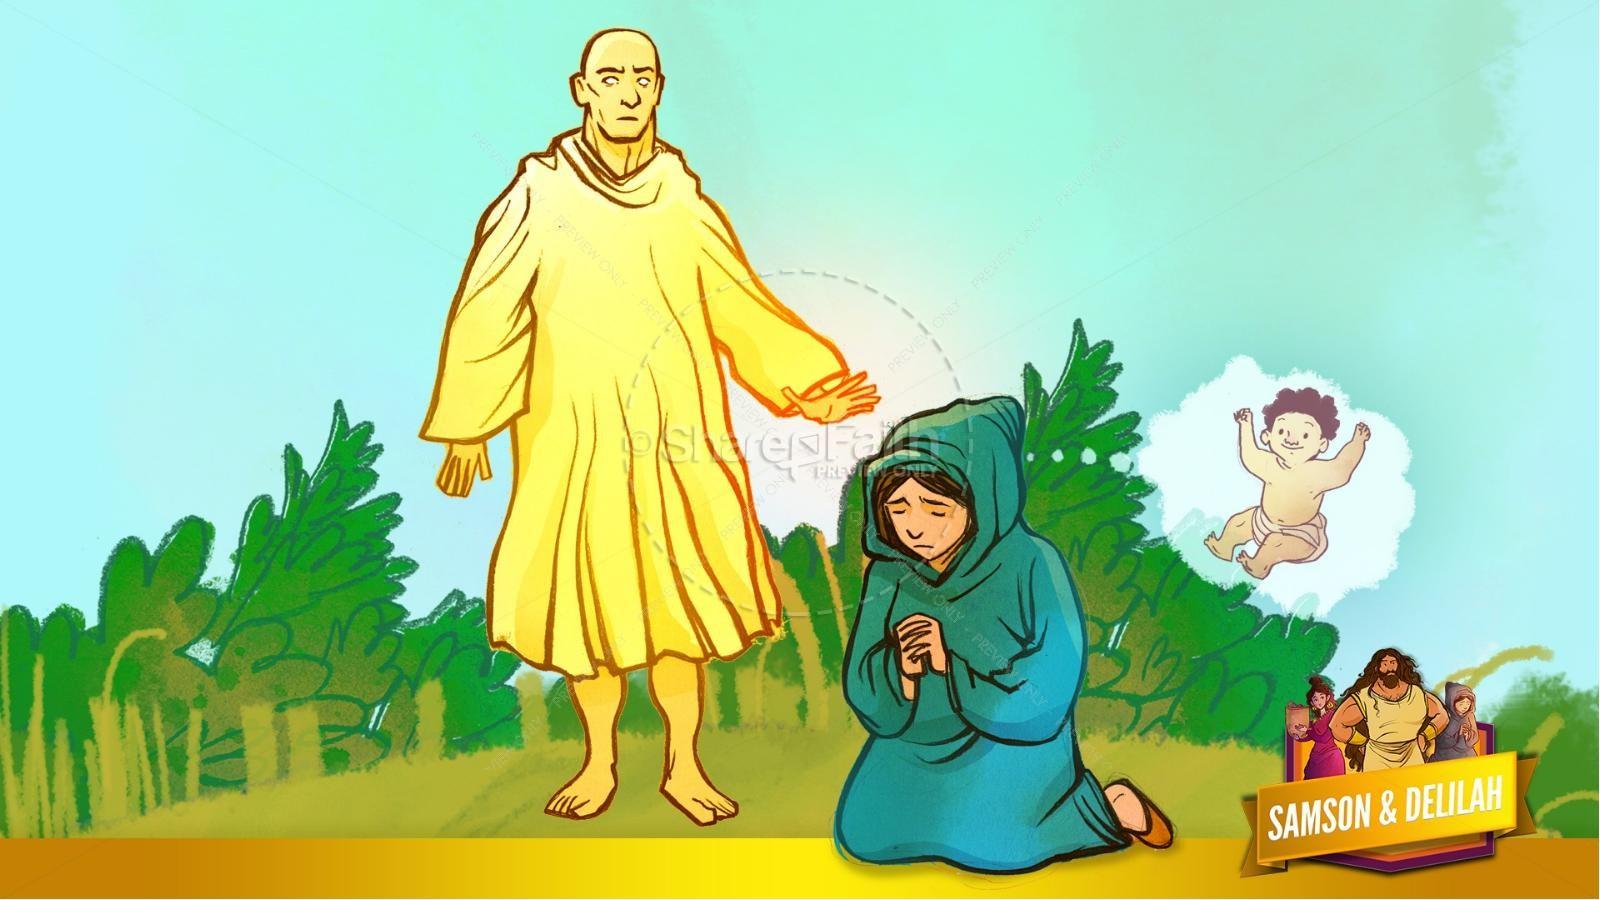 Samson and Delilah Kids Bible Stories | slide 23